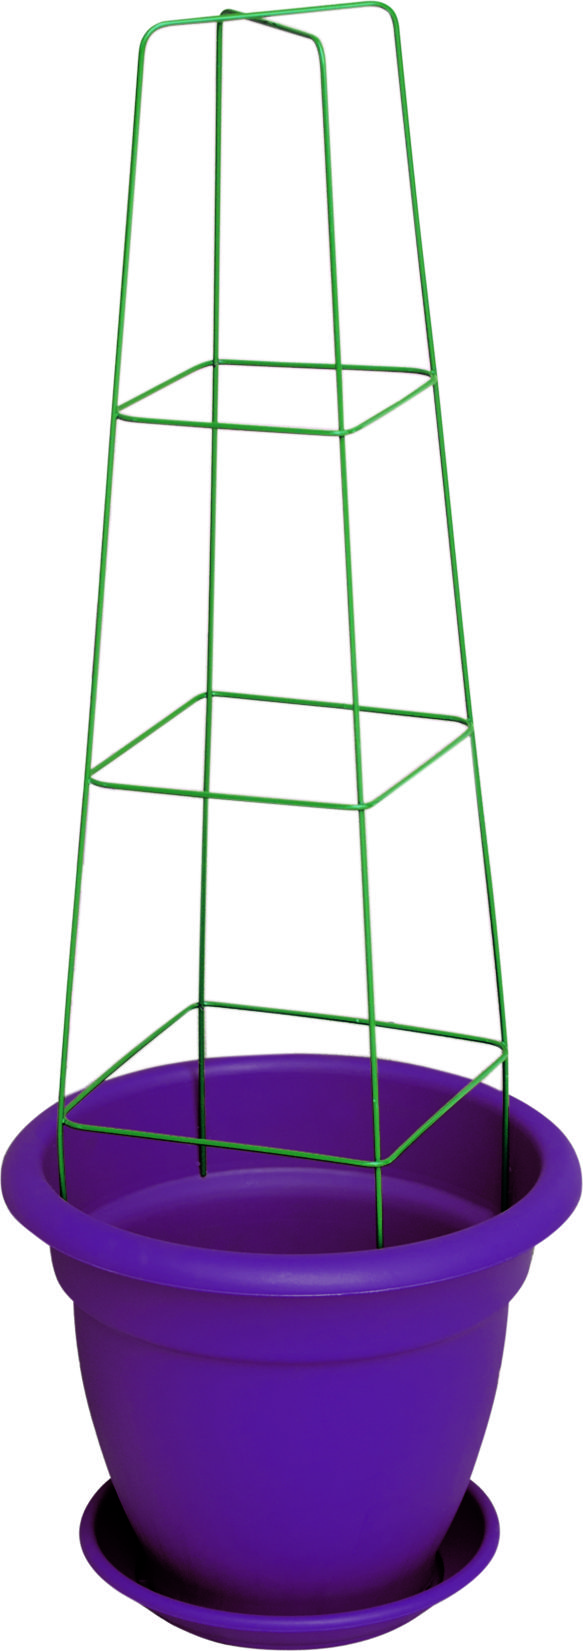 BABEL 35.2 Color: 051